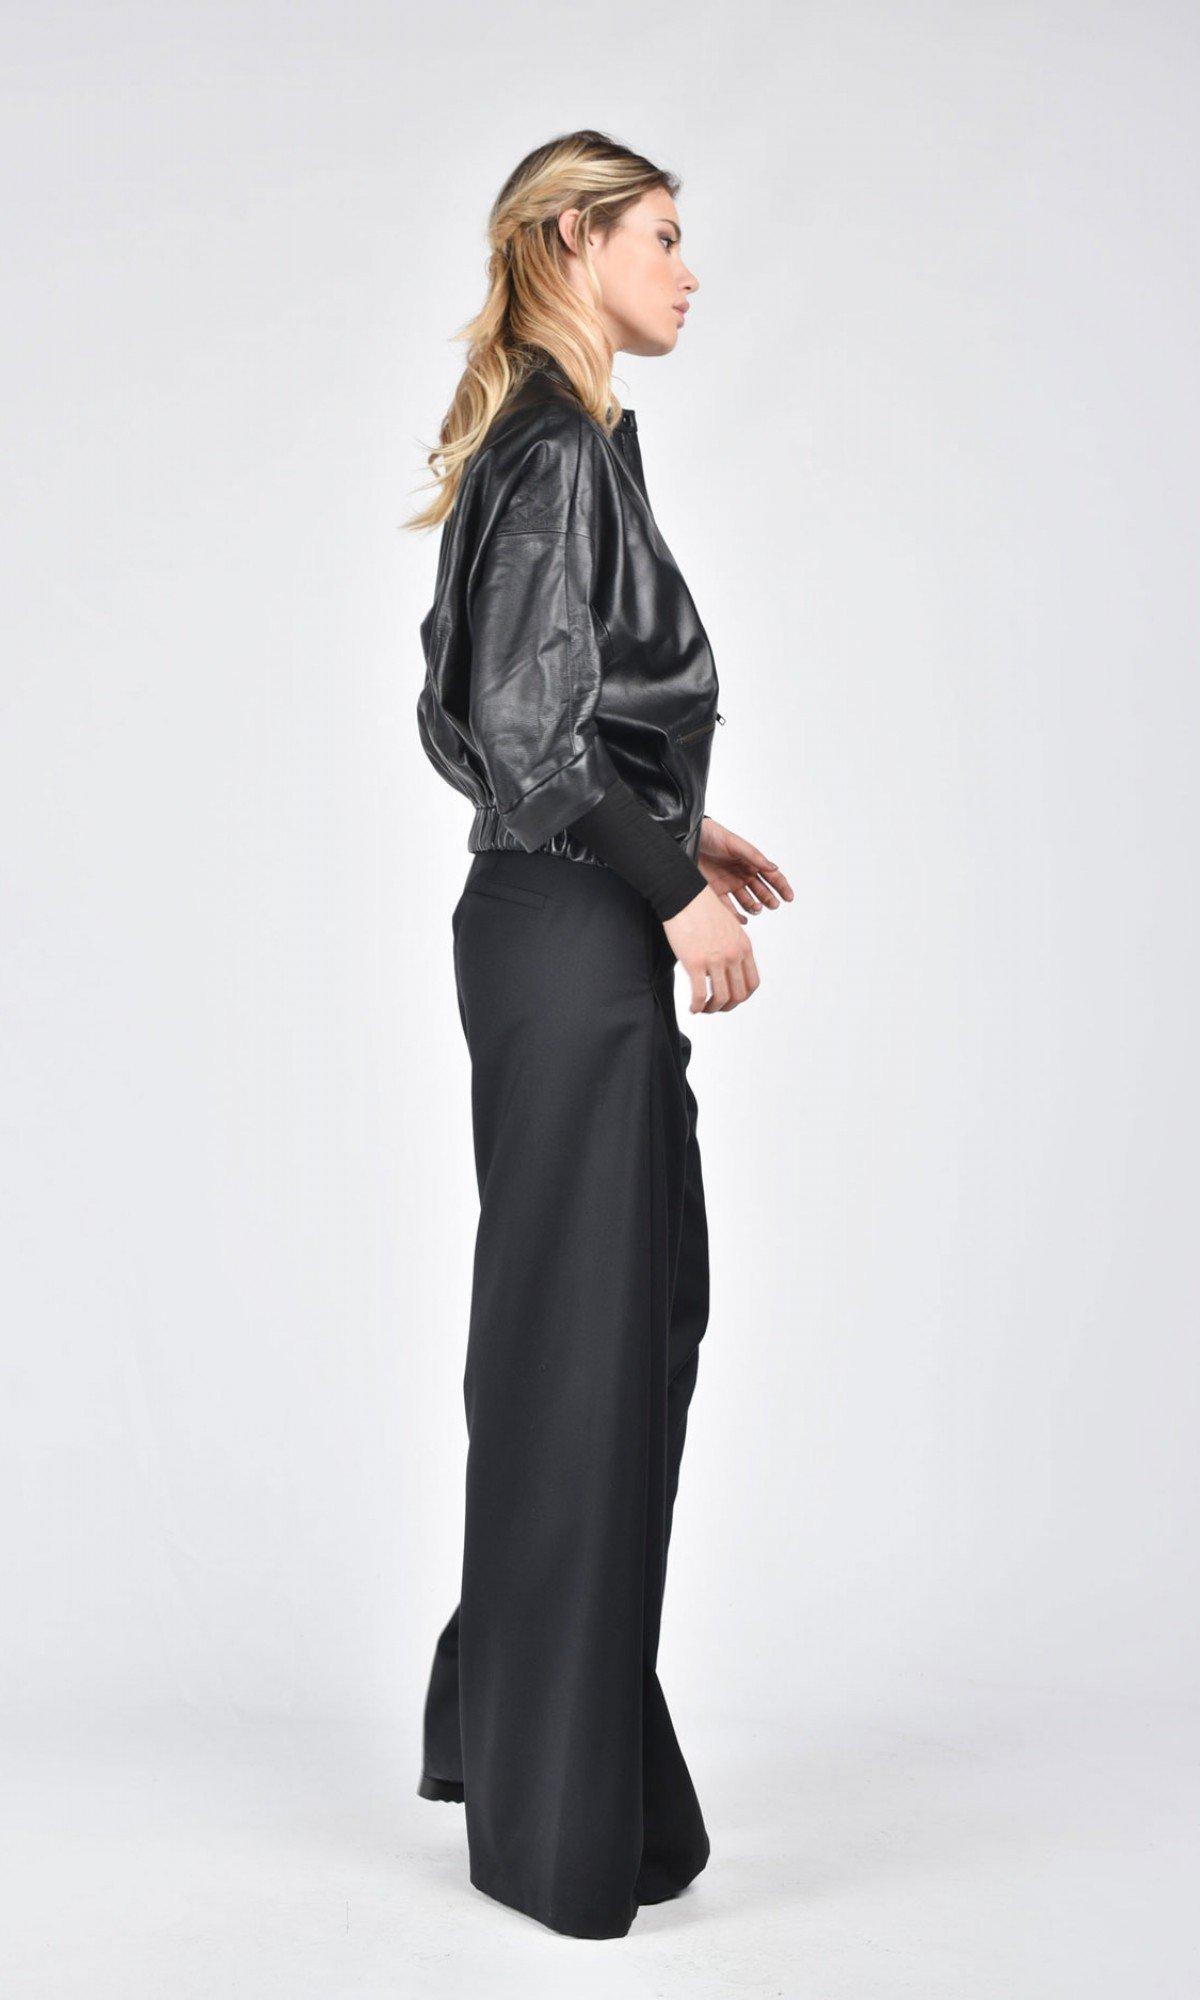 Short Black Genuine Leather Jacket